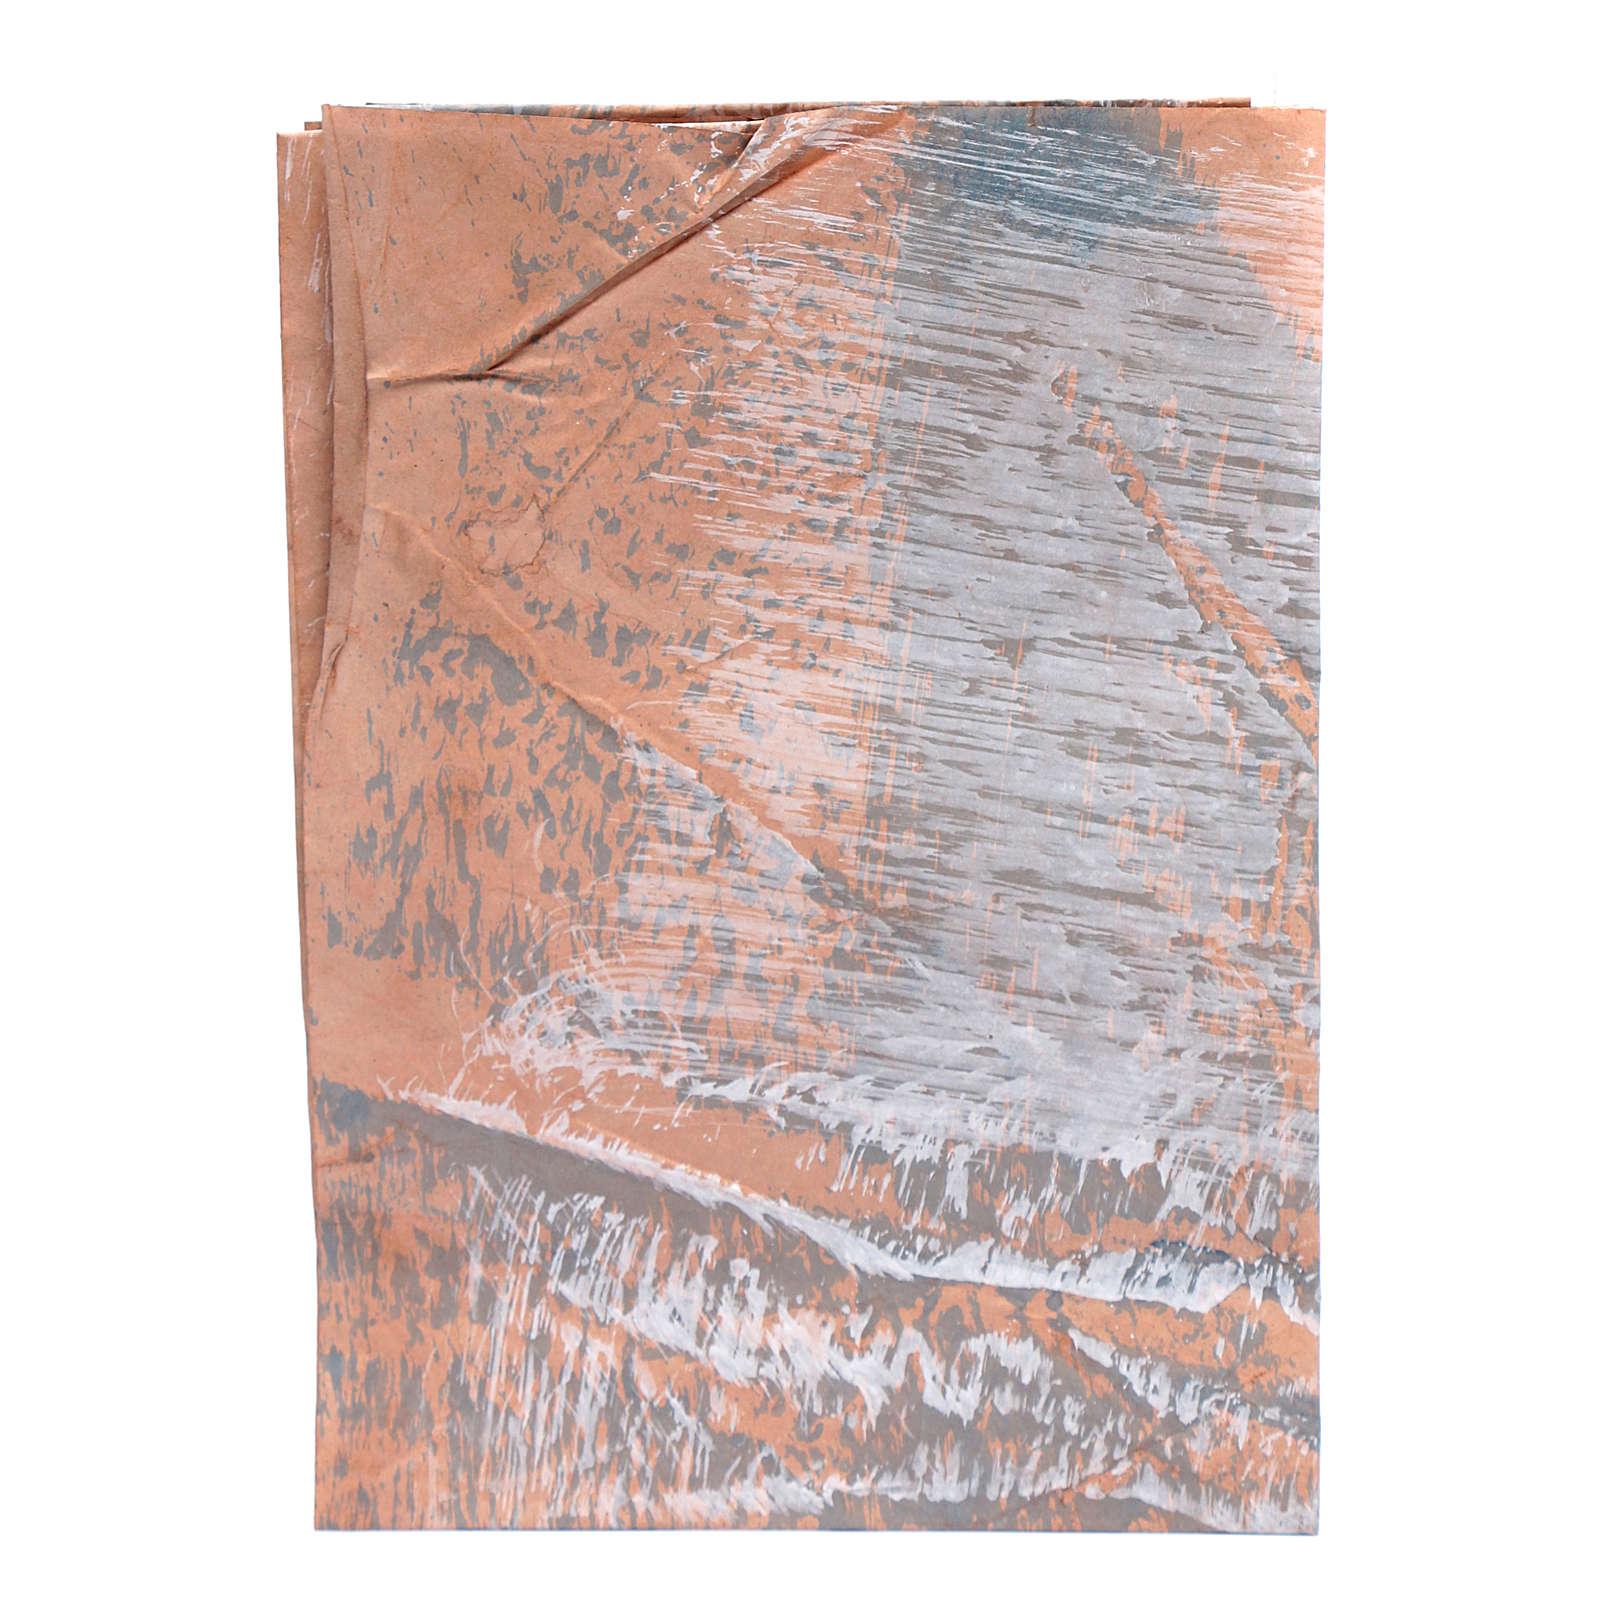 DIY nativity scene rock paper 70x100 cm hand painted 4